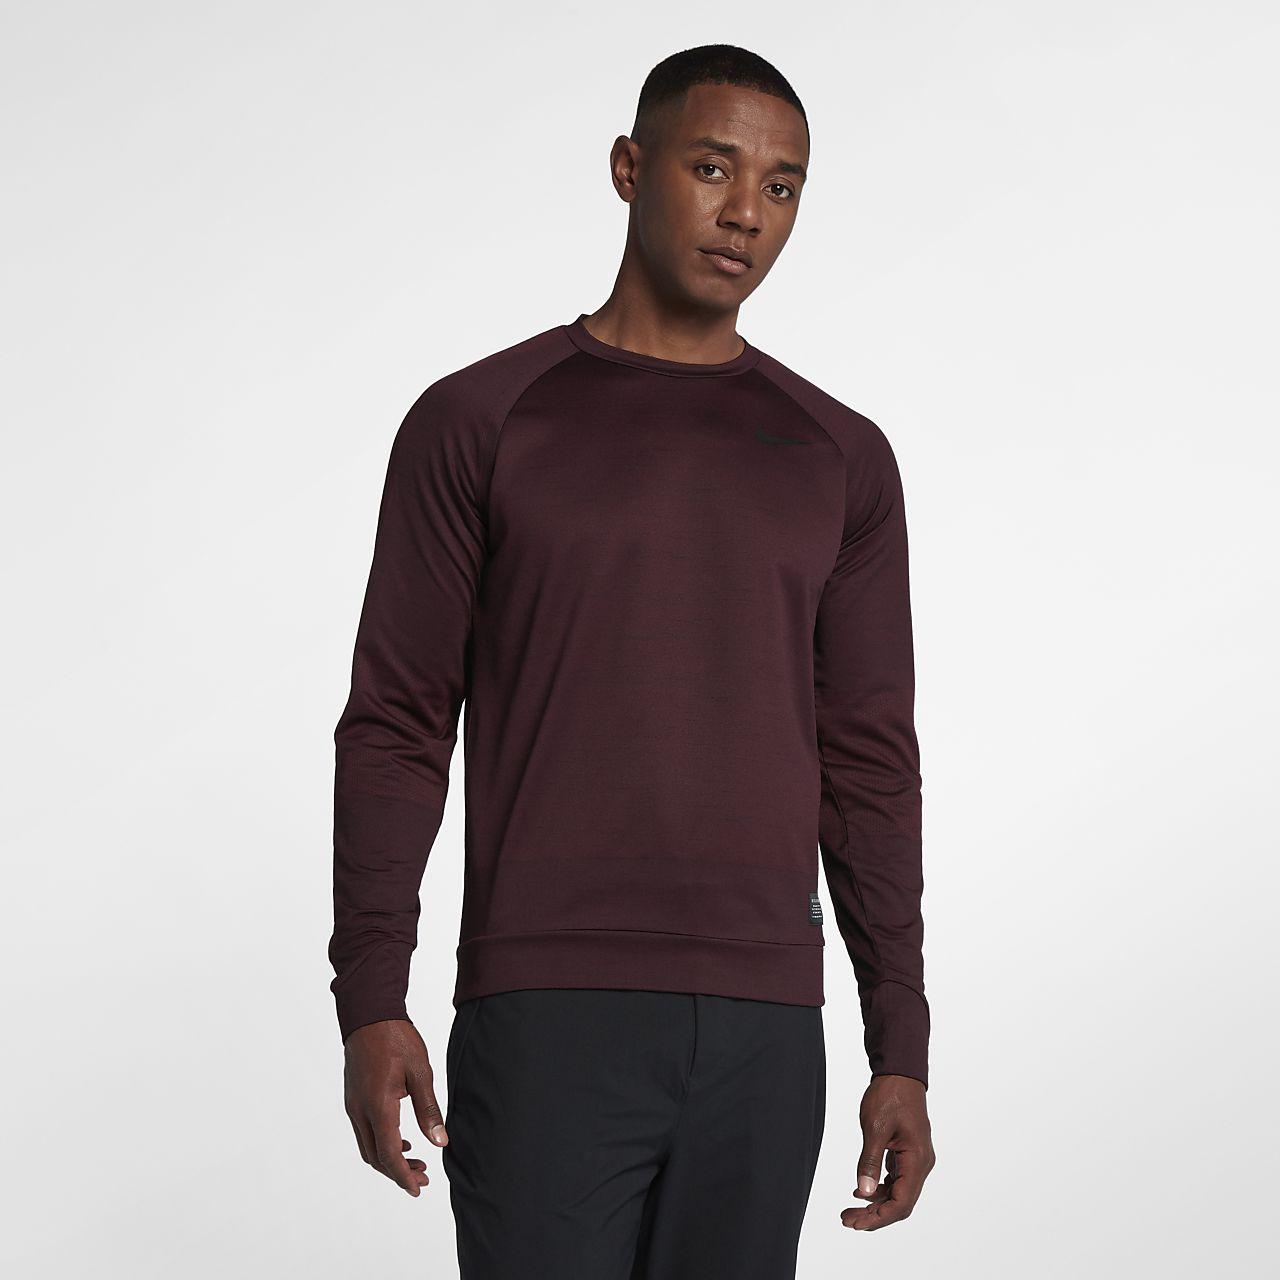 Nike Dri-FIT Men's Long Sleeve Golf Top